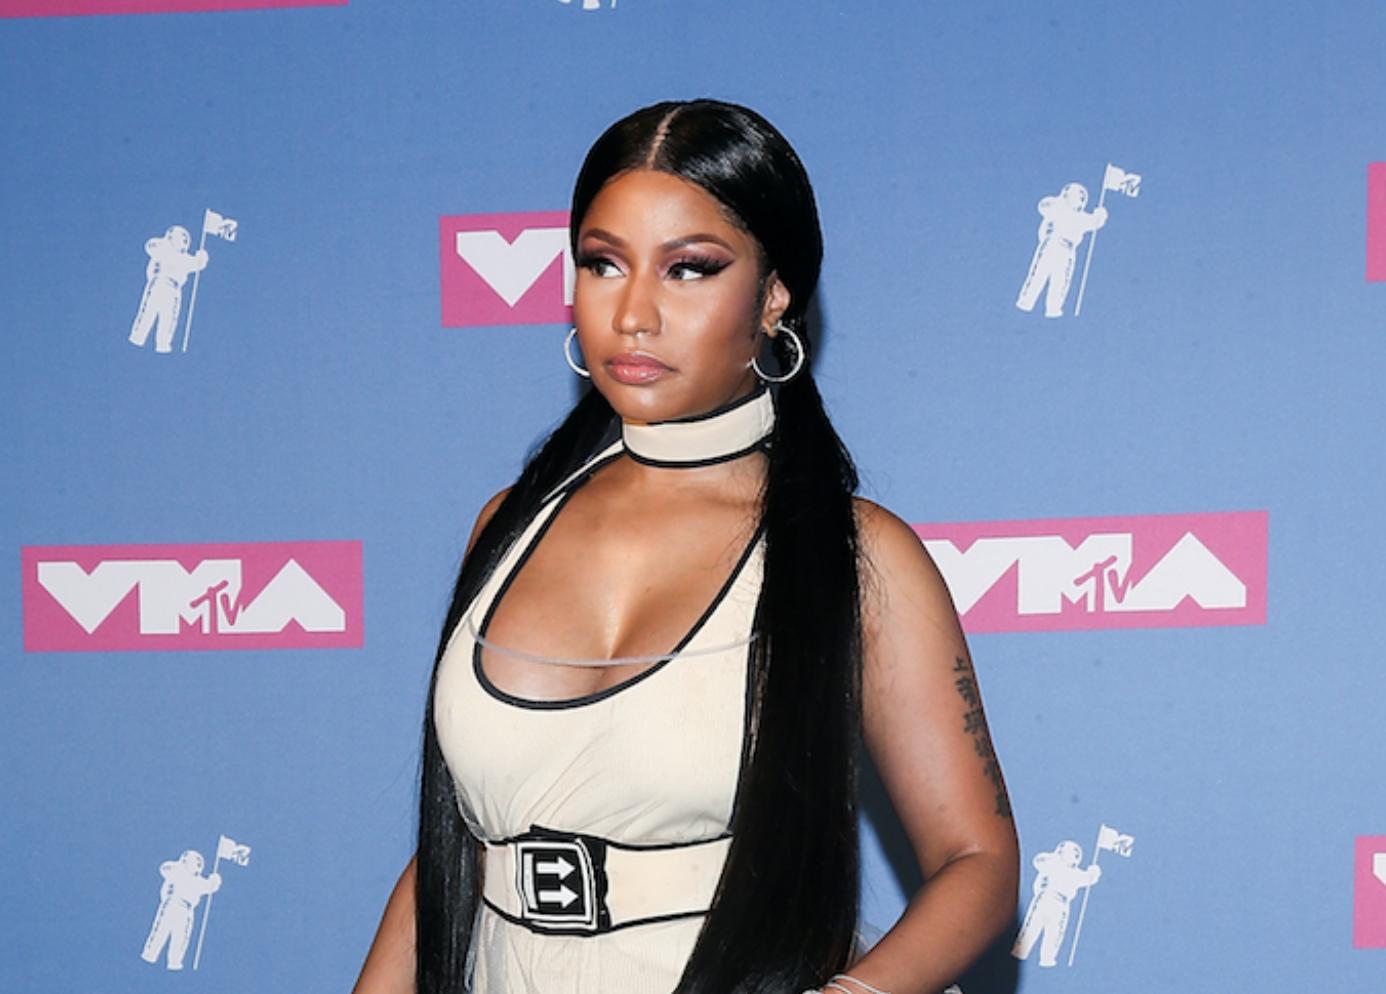 Nicki Minaj Slams Steve Madden For Calling Her a Liar